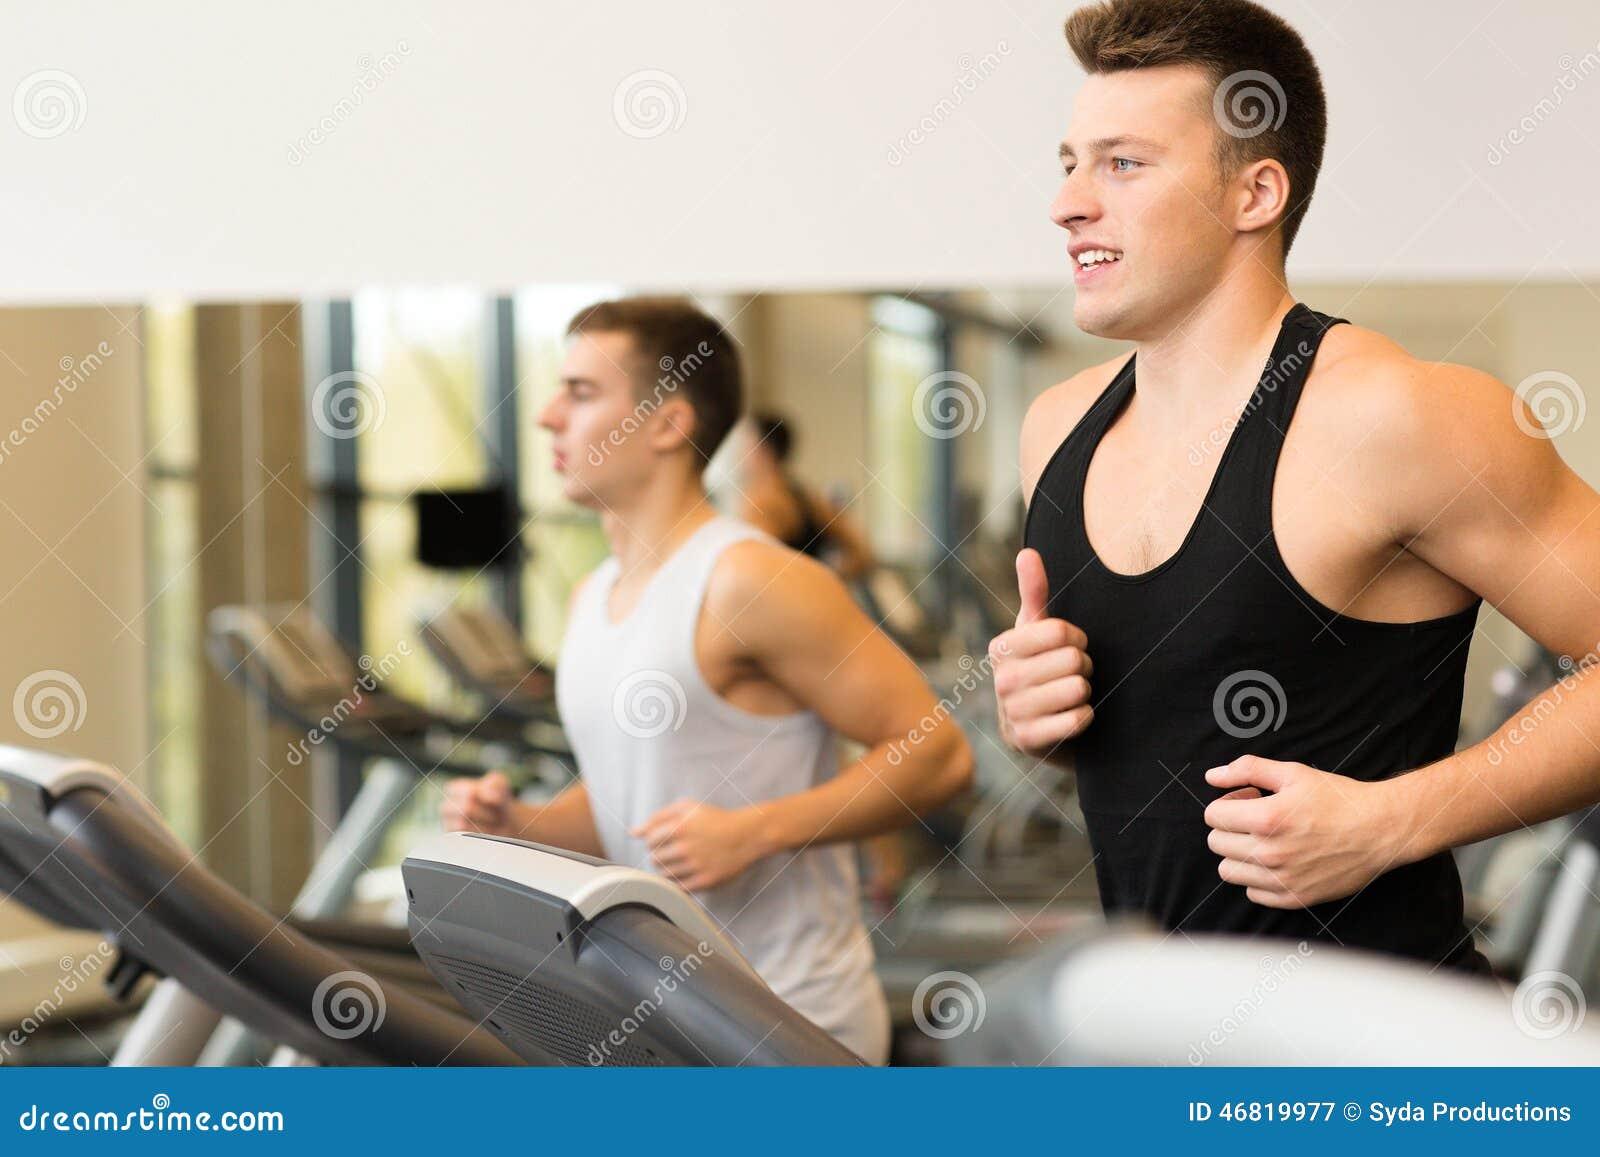 Smiling men exercising on treadmill in gym